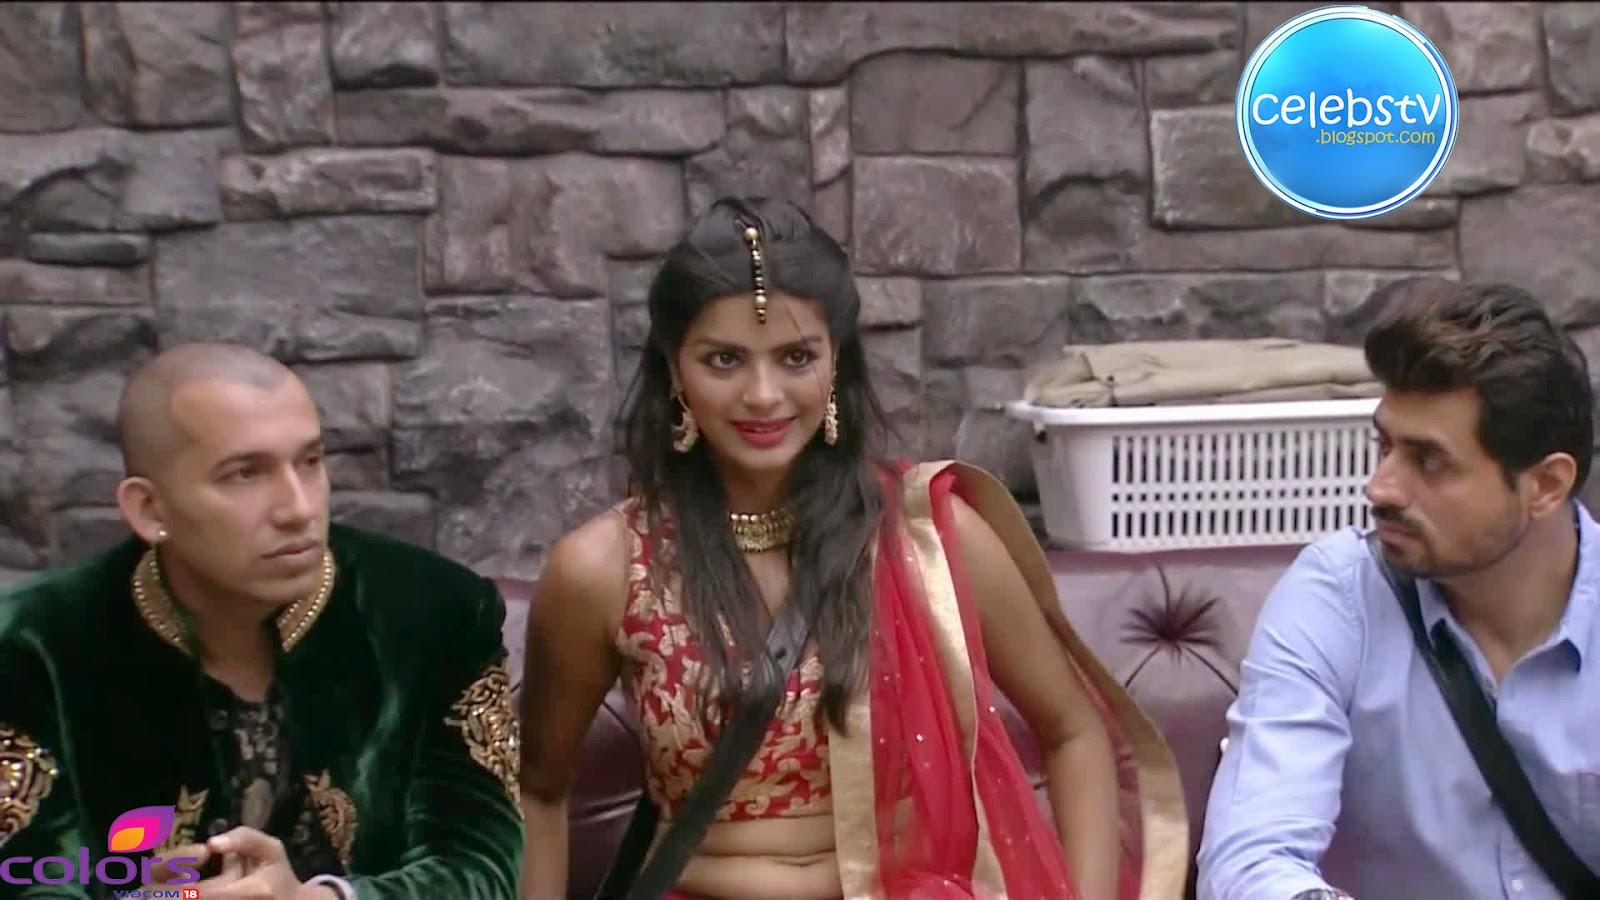 Sonali Raut Hot Navel Show In Bigg Boss 8 - Sexy Celebs World-8384